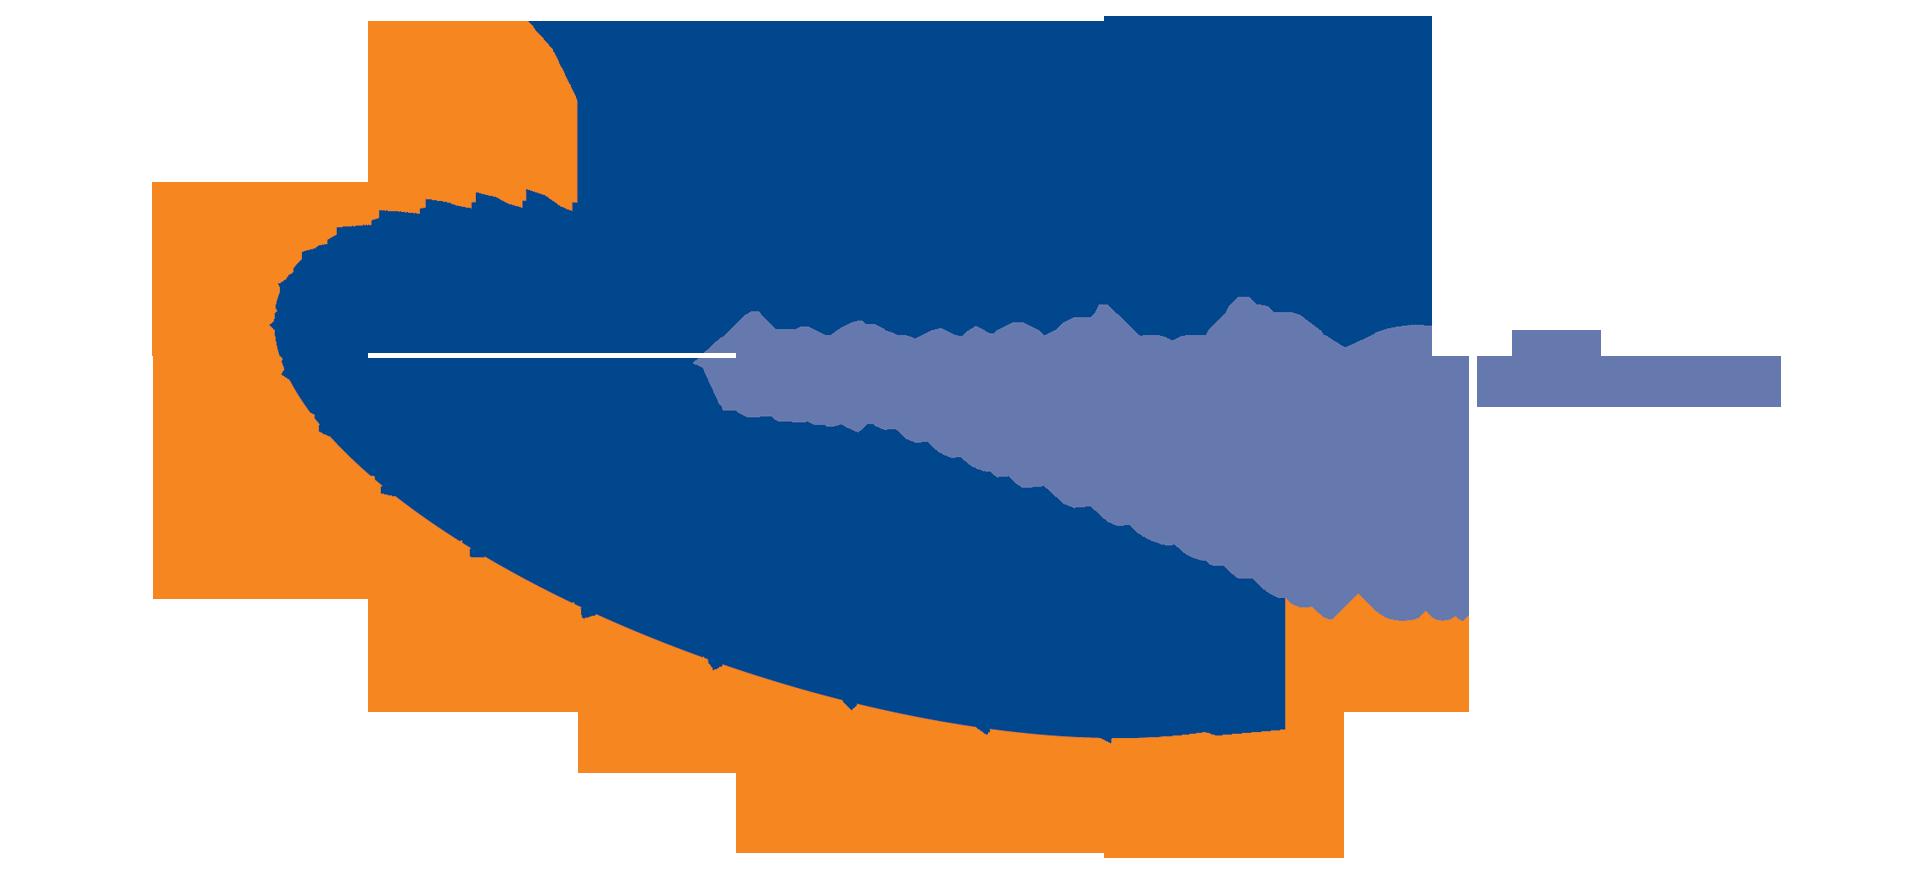 https://wanna-grow.com/wp-content/uploads/2020/06/Mental-Health-Caribbean-Bonaire.png